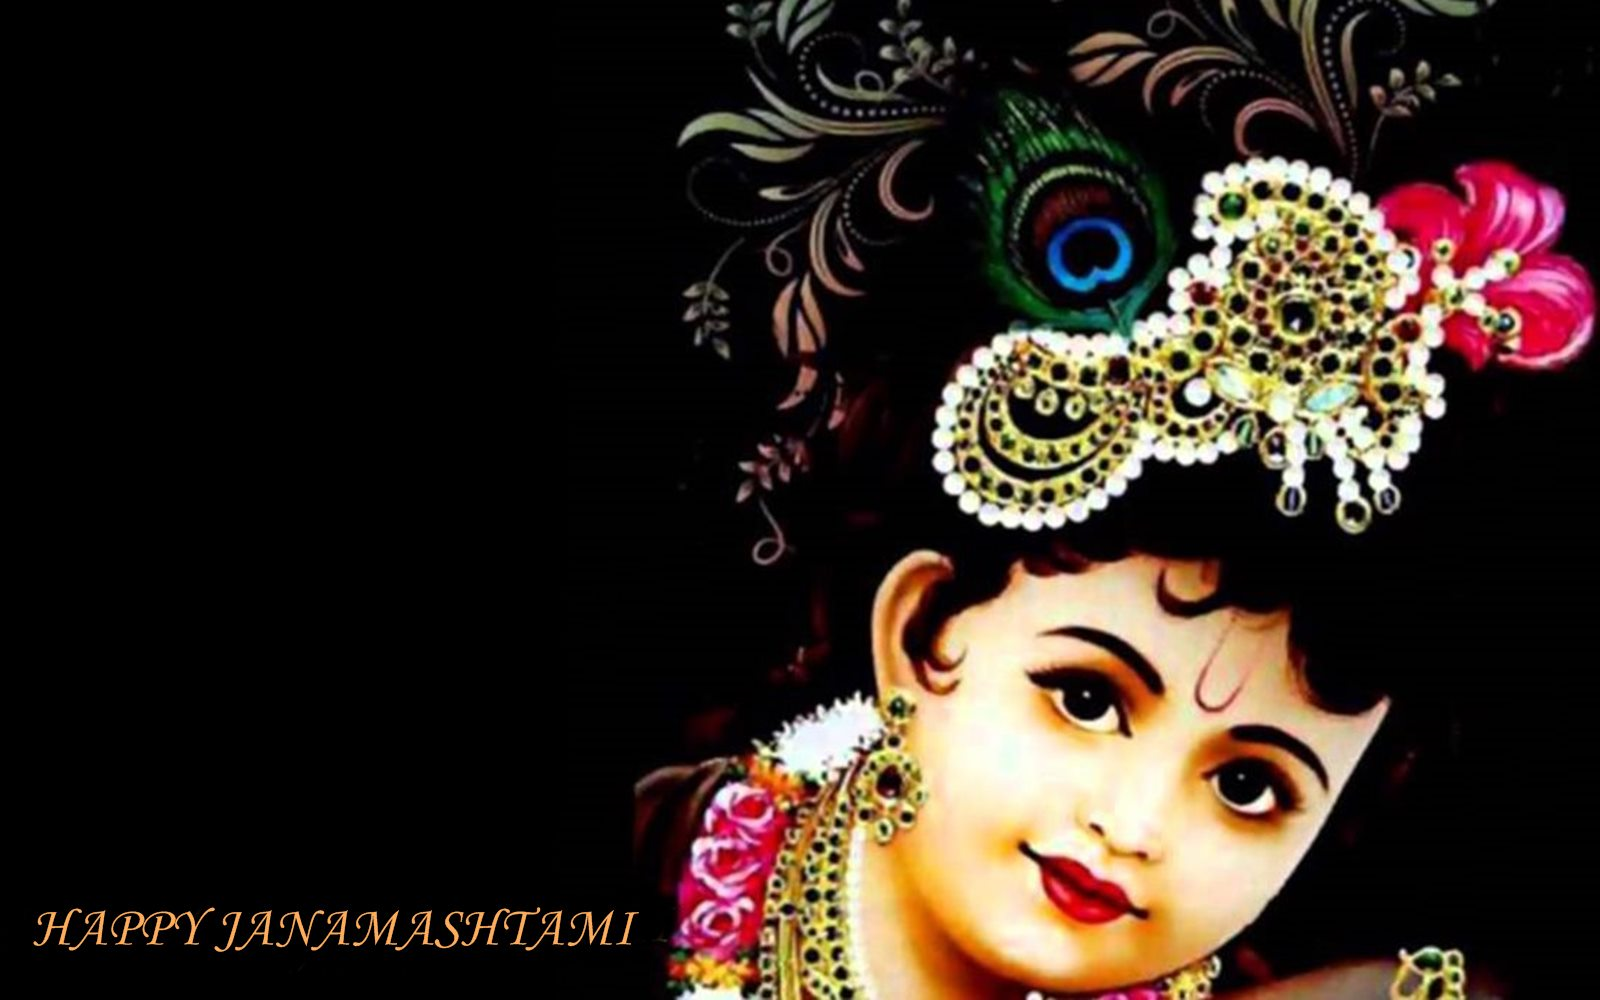 Cute Nandlala Krishna Happy Janmashtami Hd Wallpaper - Happy Cute Krishna Janmashtami - HD Wallpaper